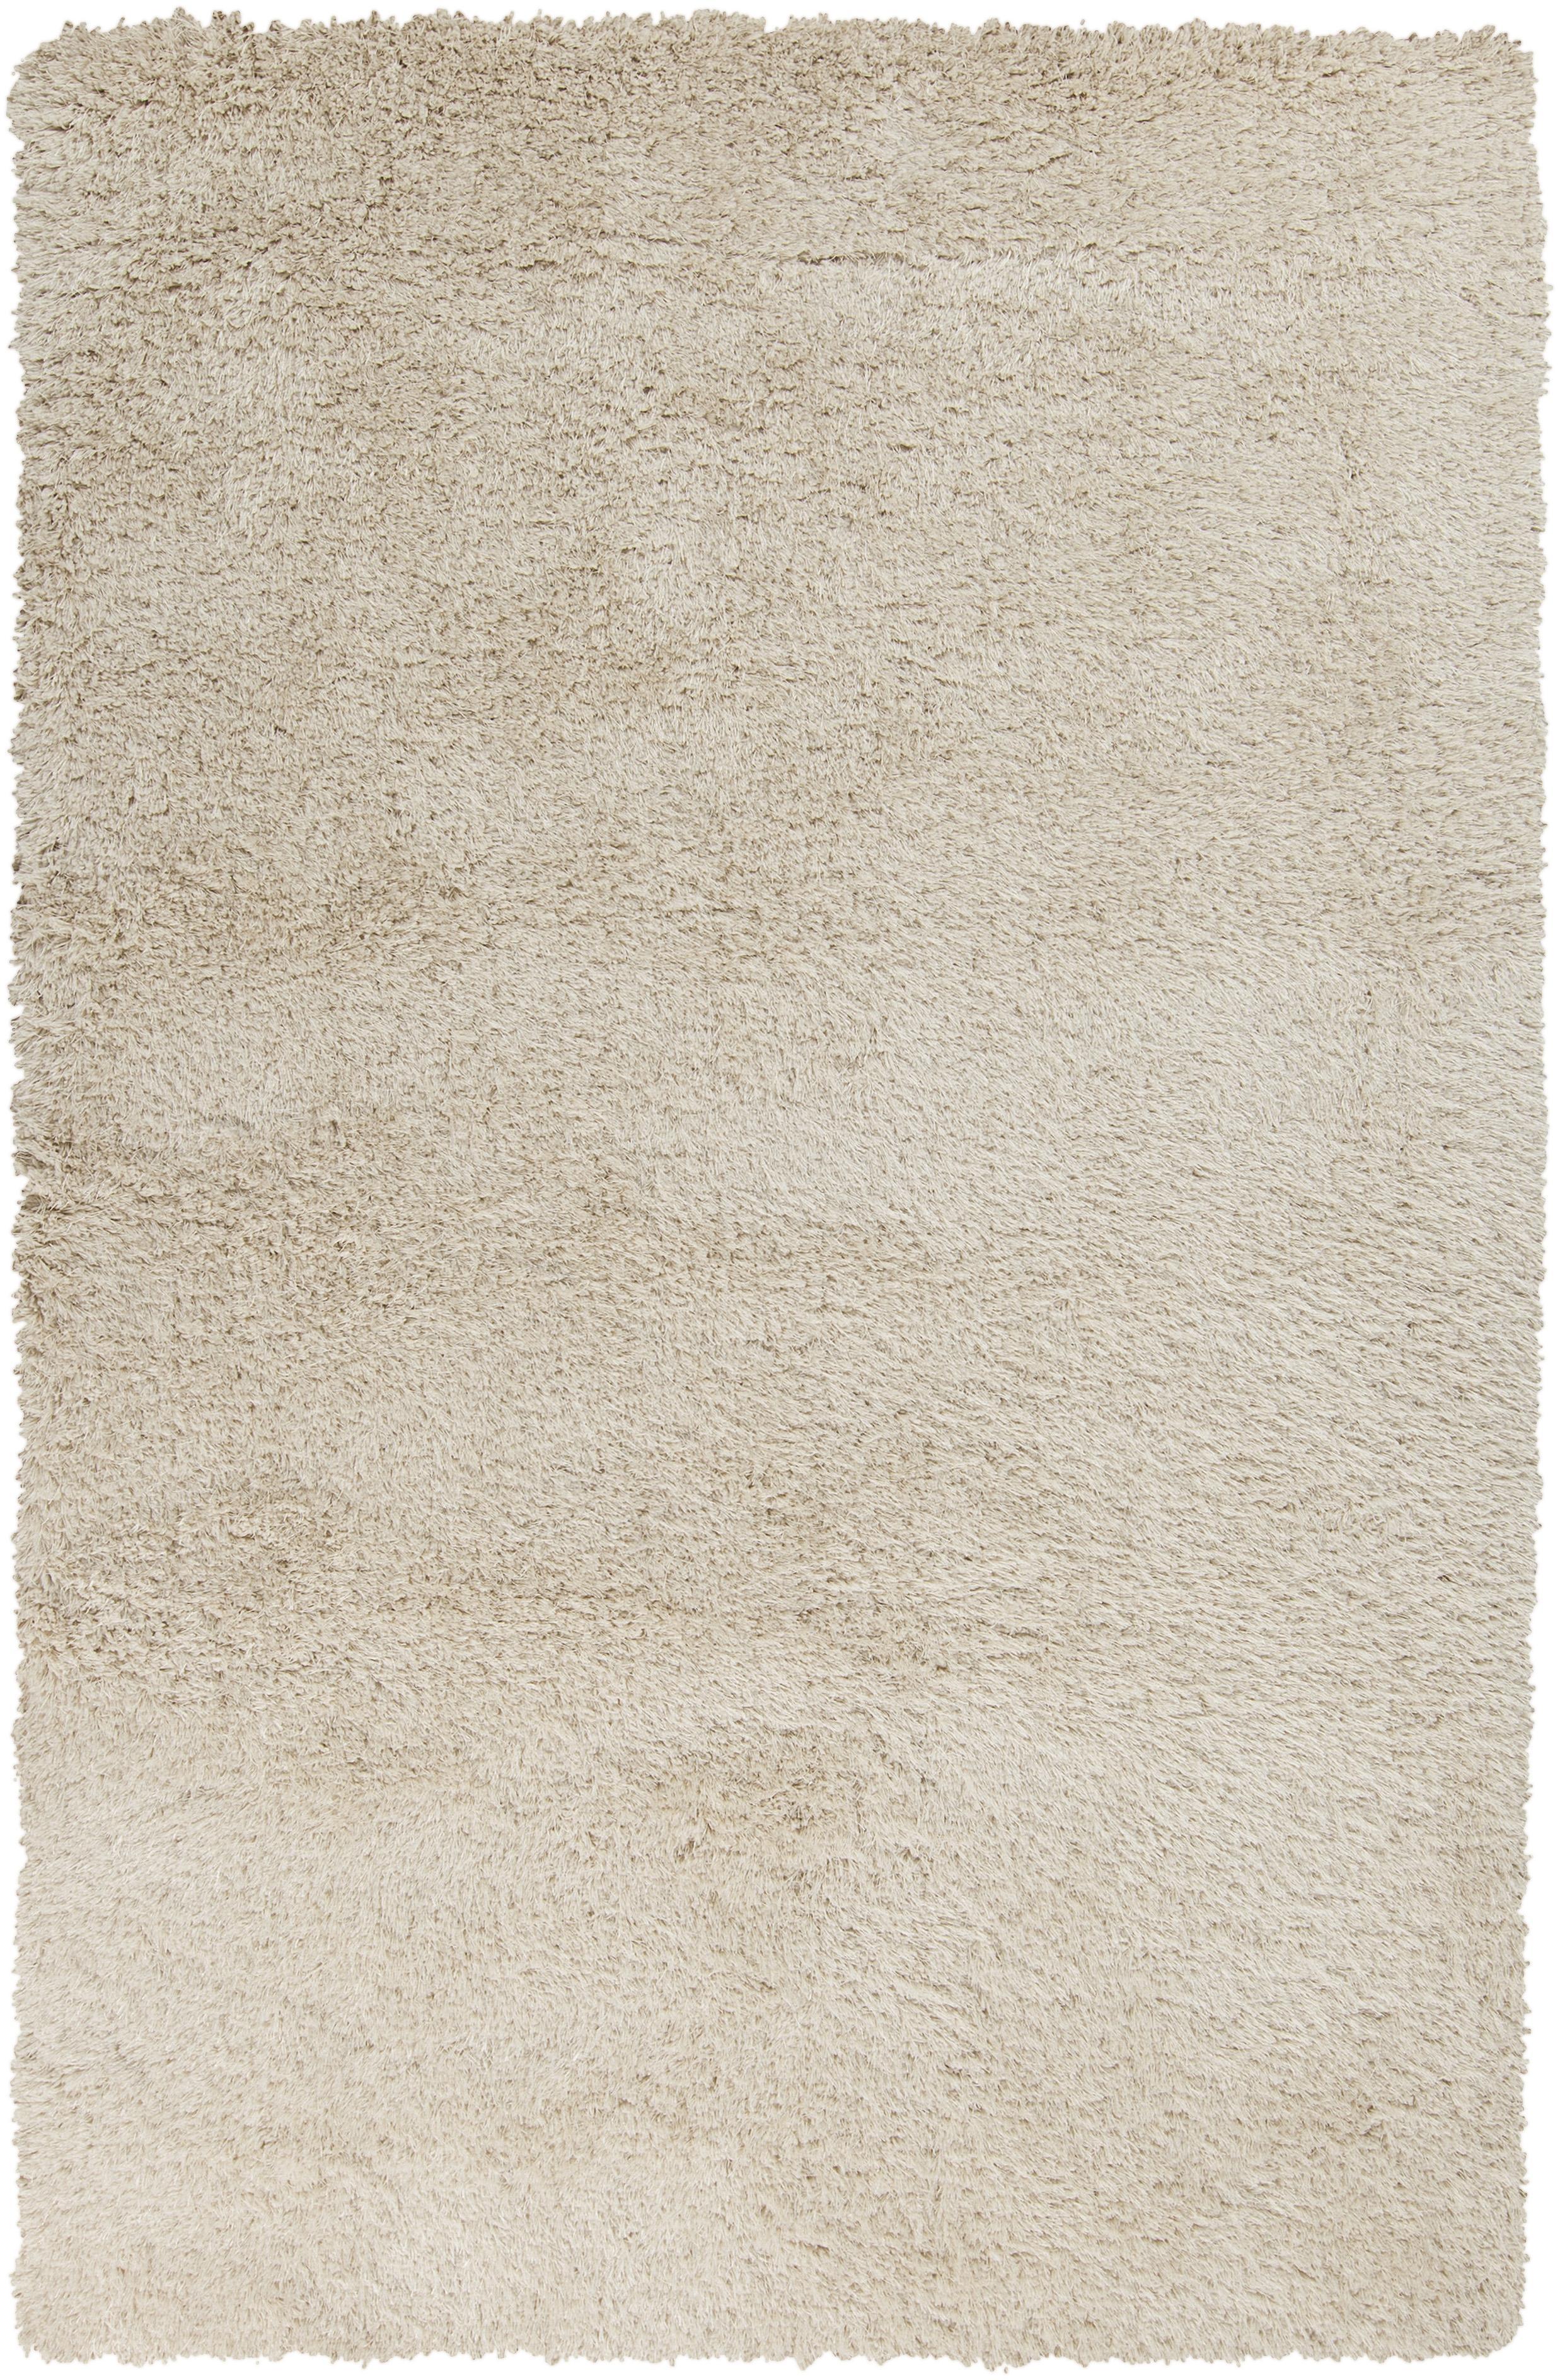 Surya Rugs Portland 5' x 8' - Item Number: PLD2001-58